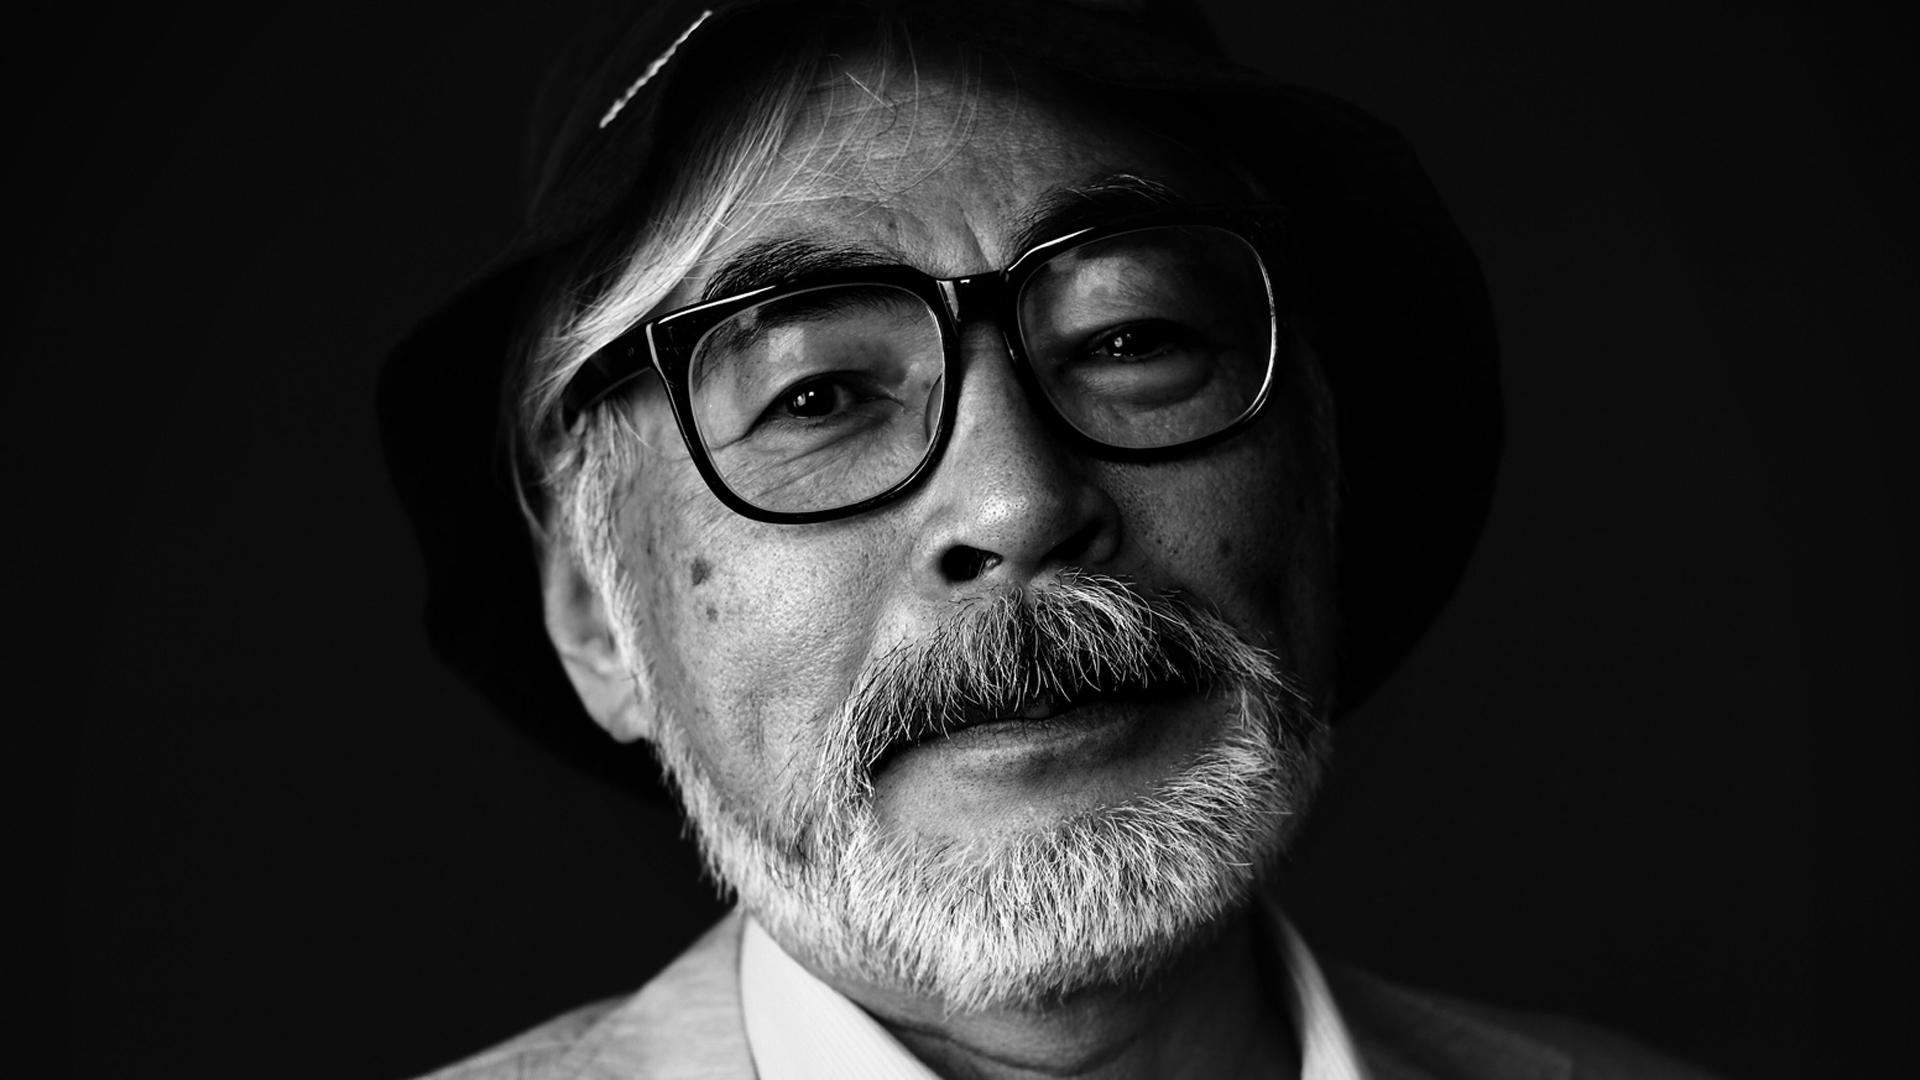 High Resolution Wallpaper | Hayao Miyazaki 1920x1080 px